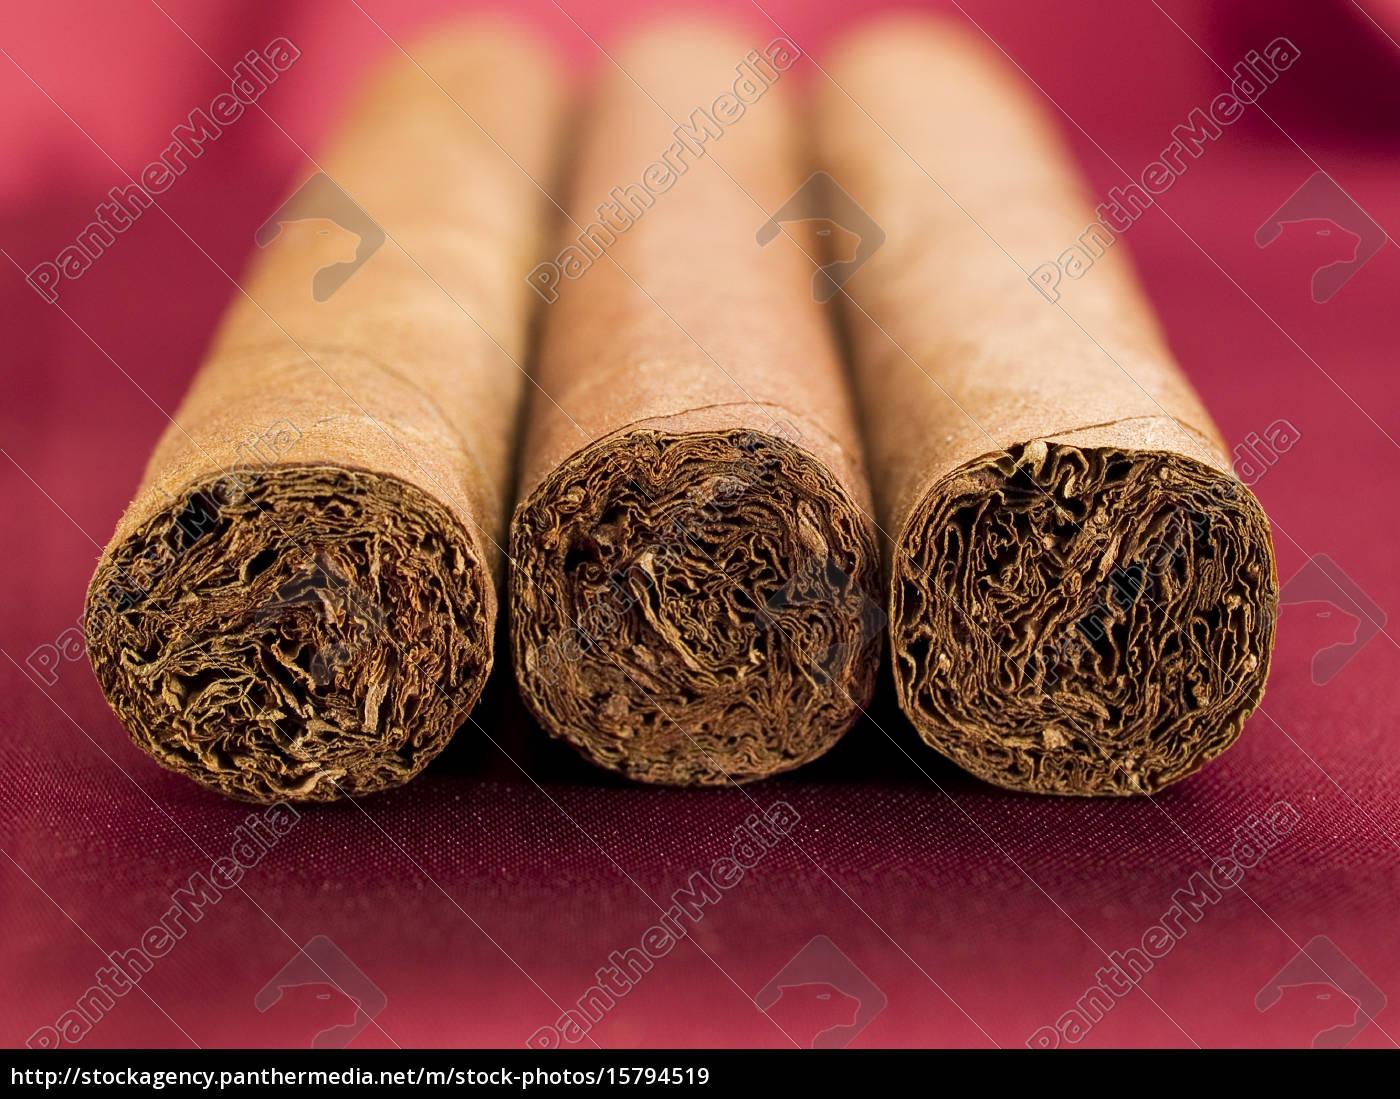 three, cigars, on, red, satin, three, cigars - 15794519